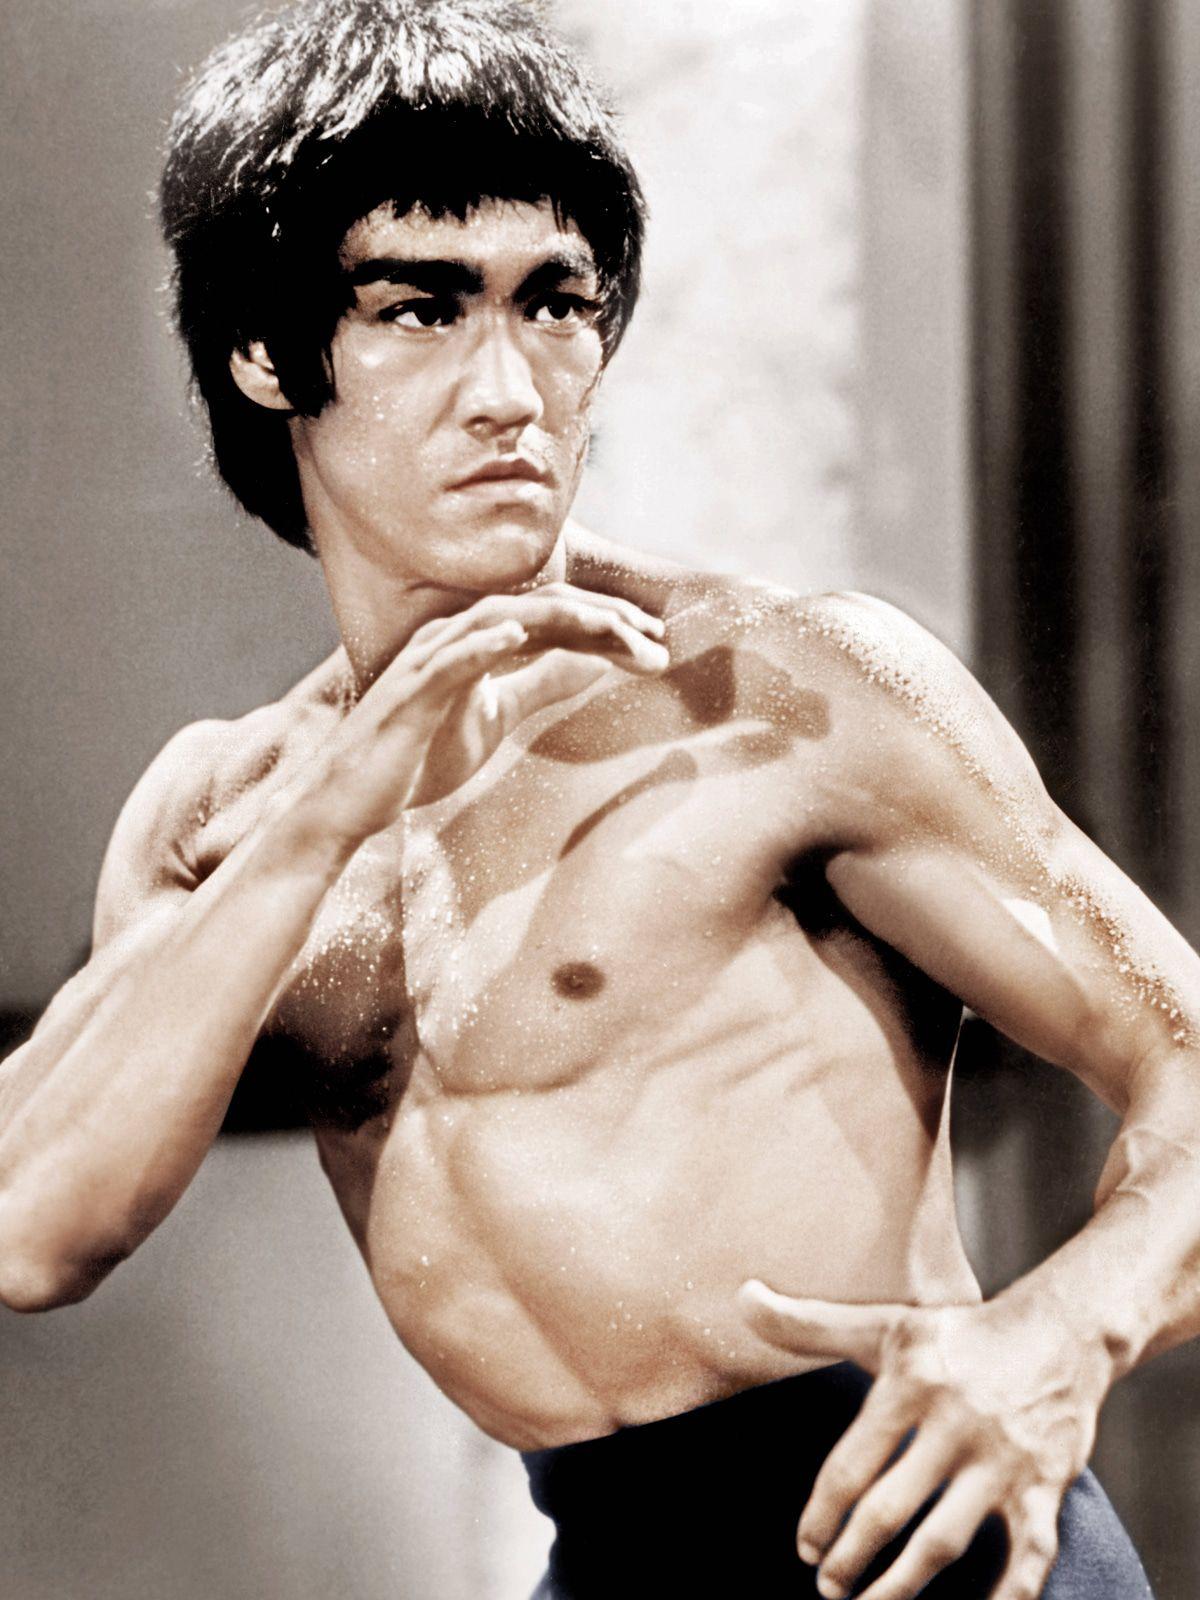 Kampfkünstler, Philosoph, Popikone: Bruce Lee wäre jetzt 80